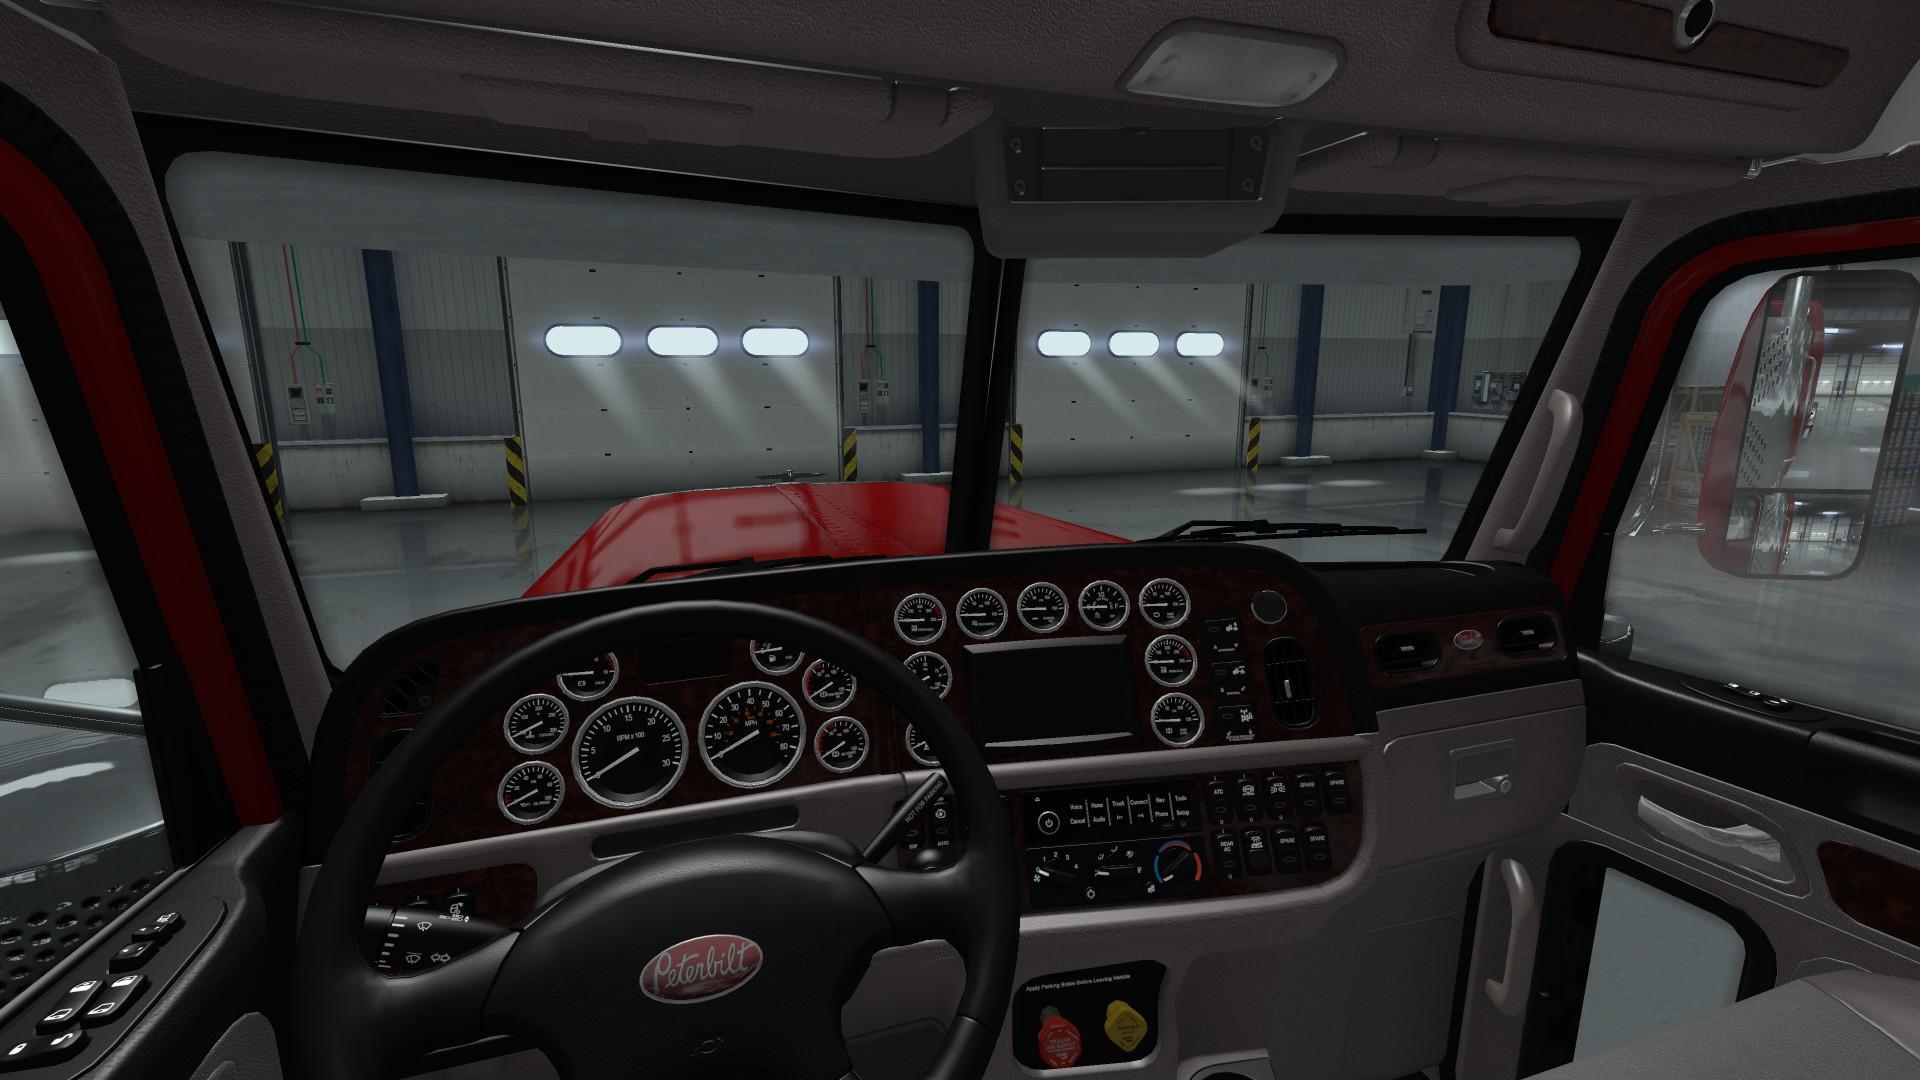 Peterbilt 389 Interior Exterior Rework V1 0 For Ats Ats Mod American Truck Simulator Mod